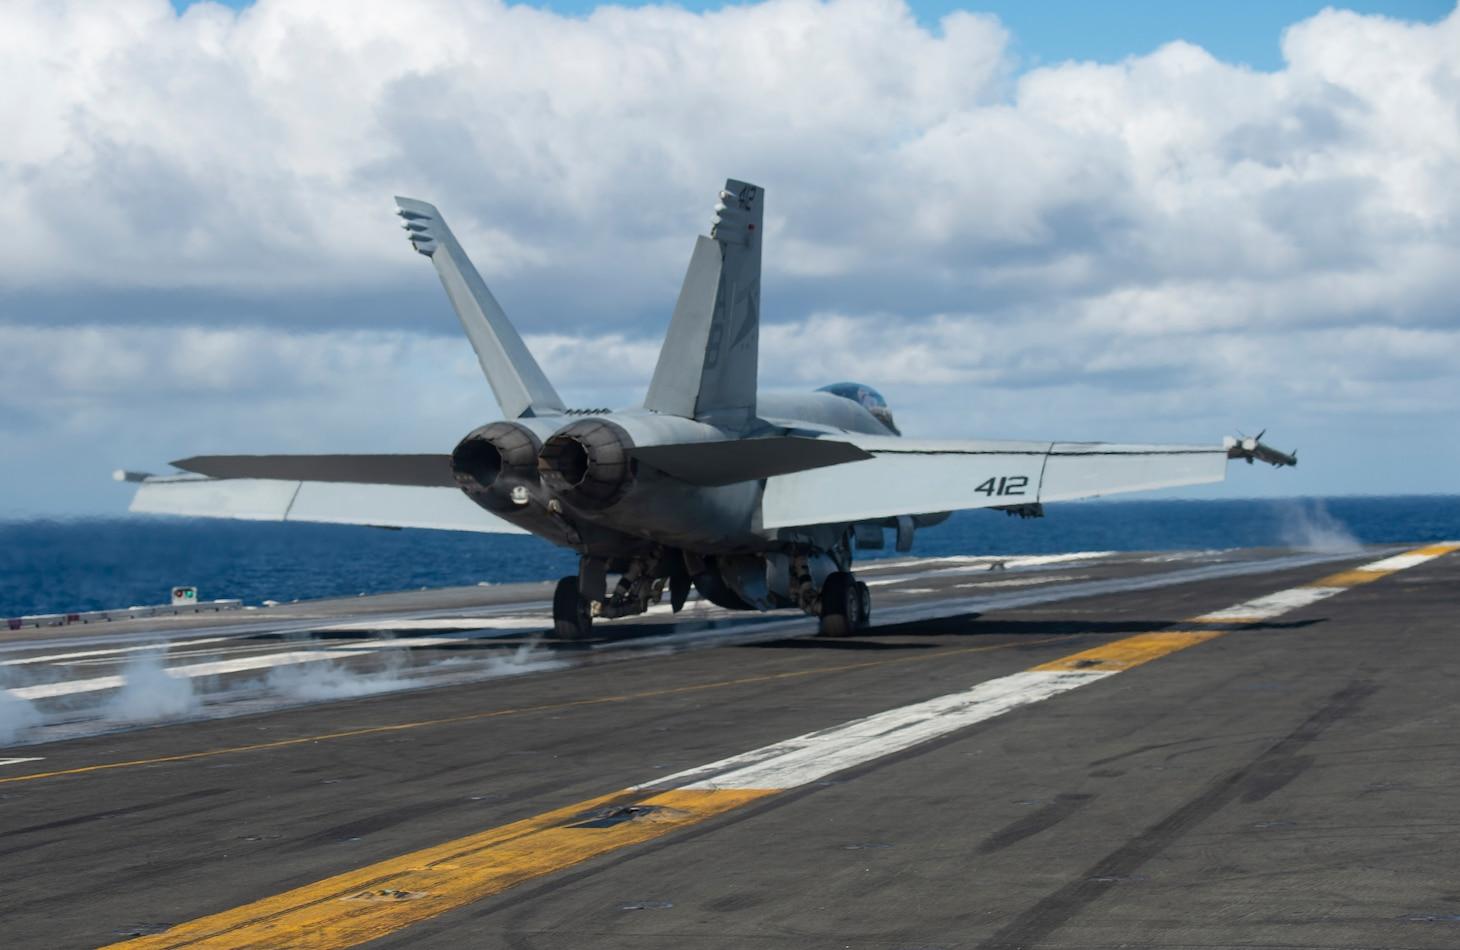 HSTCSG Enters U.S. 6th Fleet